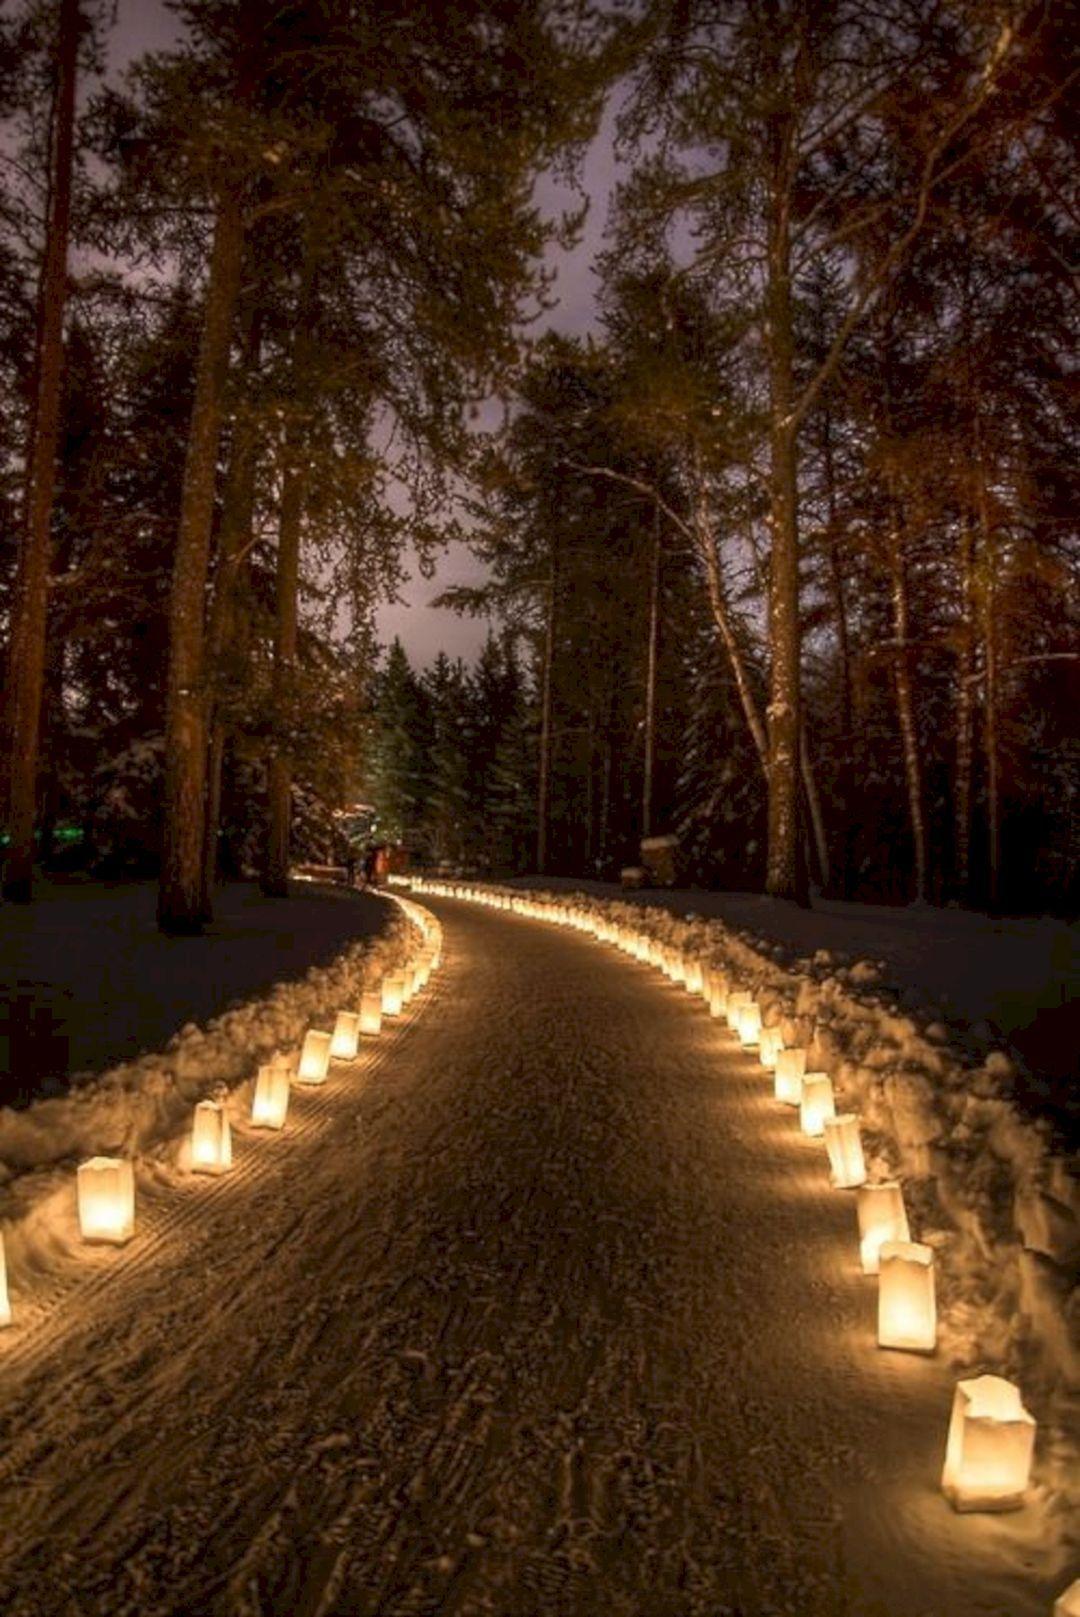 Amazing Wedding Lighting Decoration Ideas 30 Best Lighting Ideas With Images Diy Wedding Lighting Wedding Lights Lights Wedding Decor